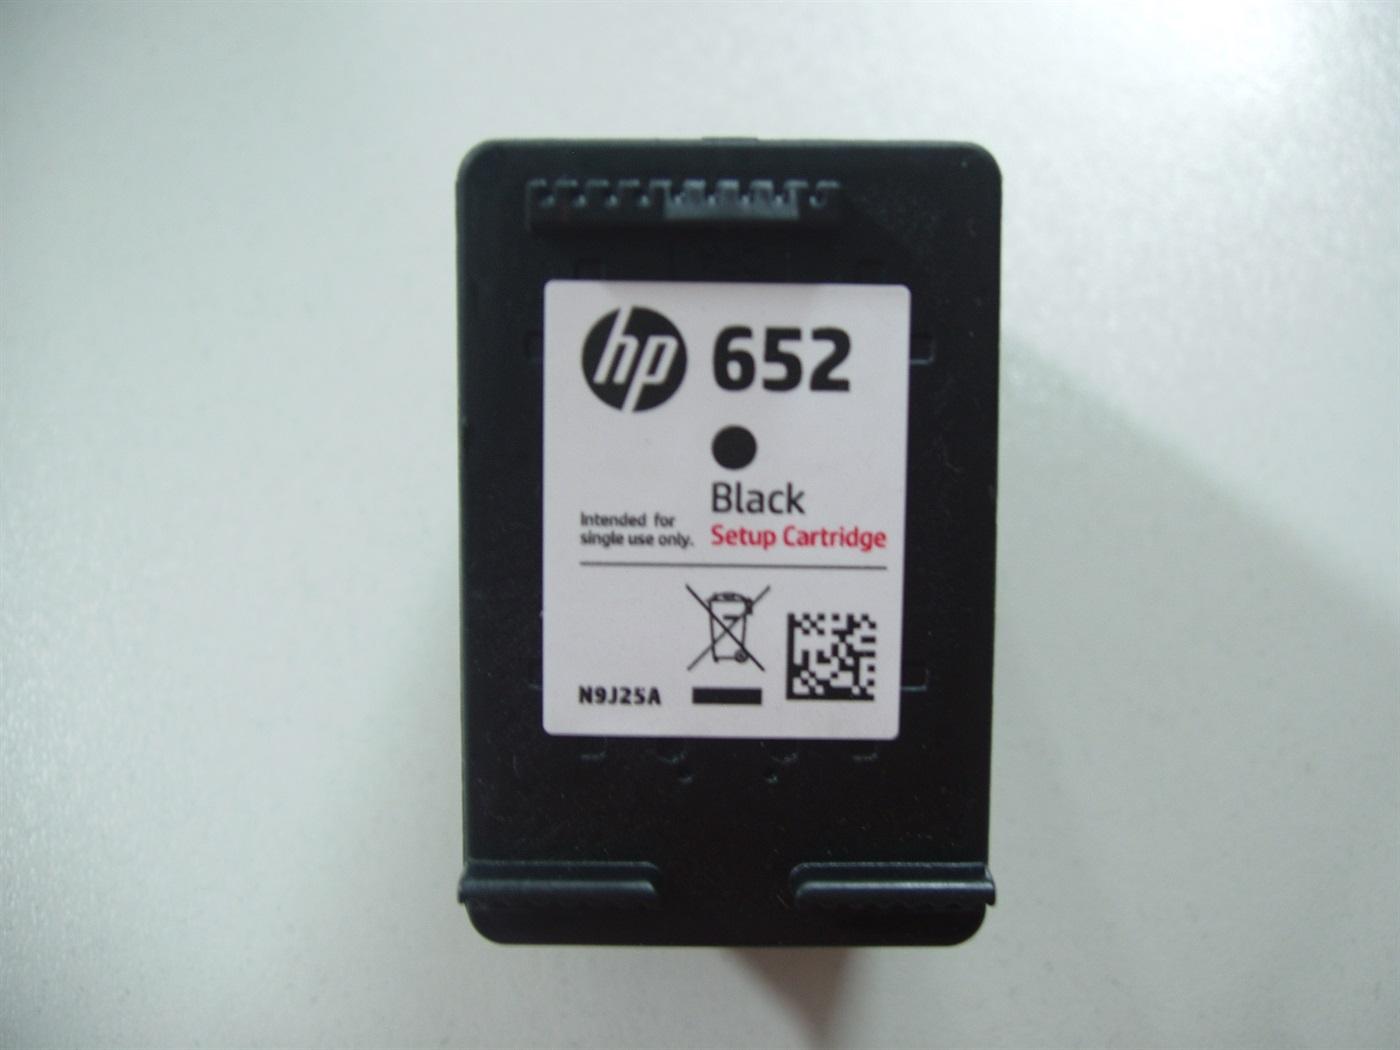 HP 652 (F6V25) black